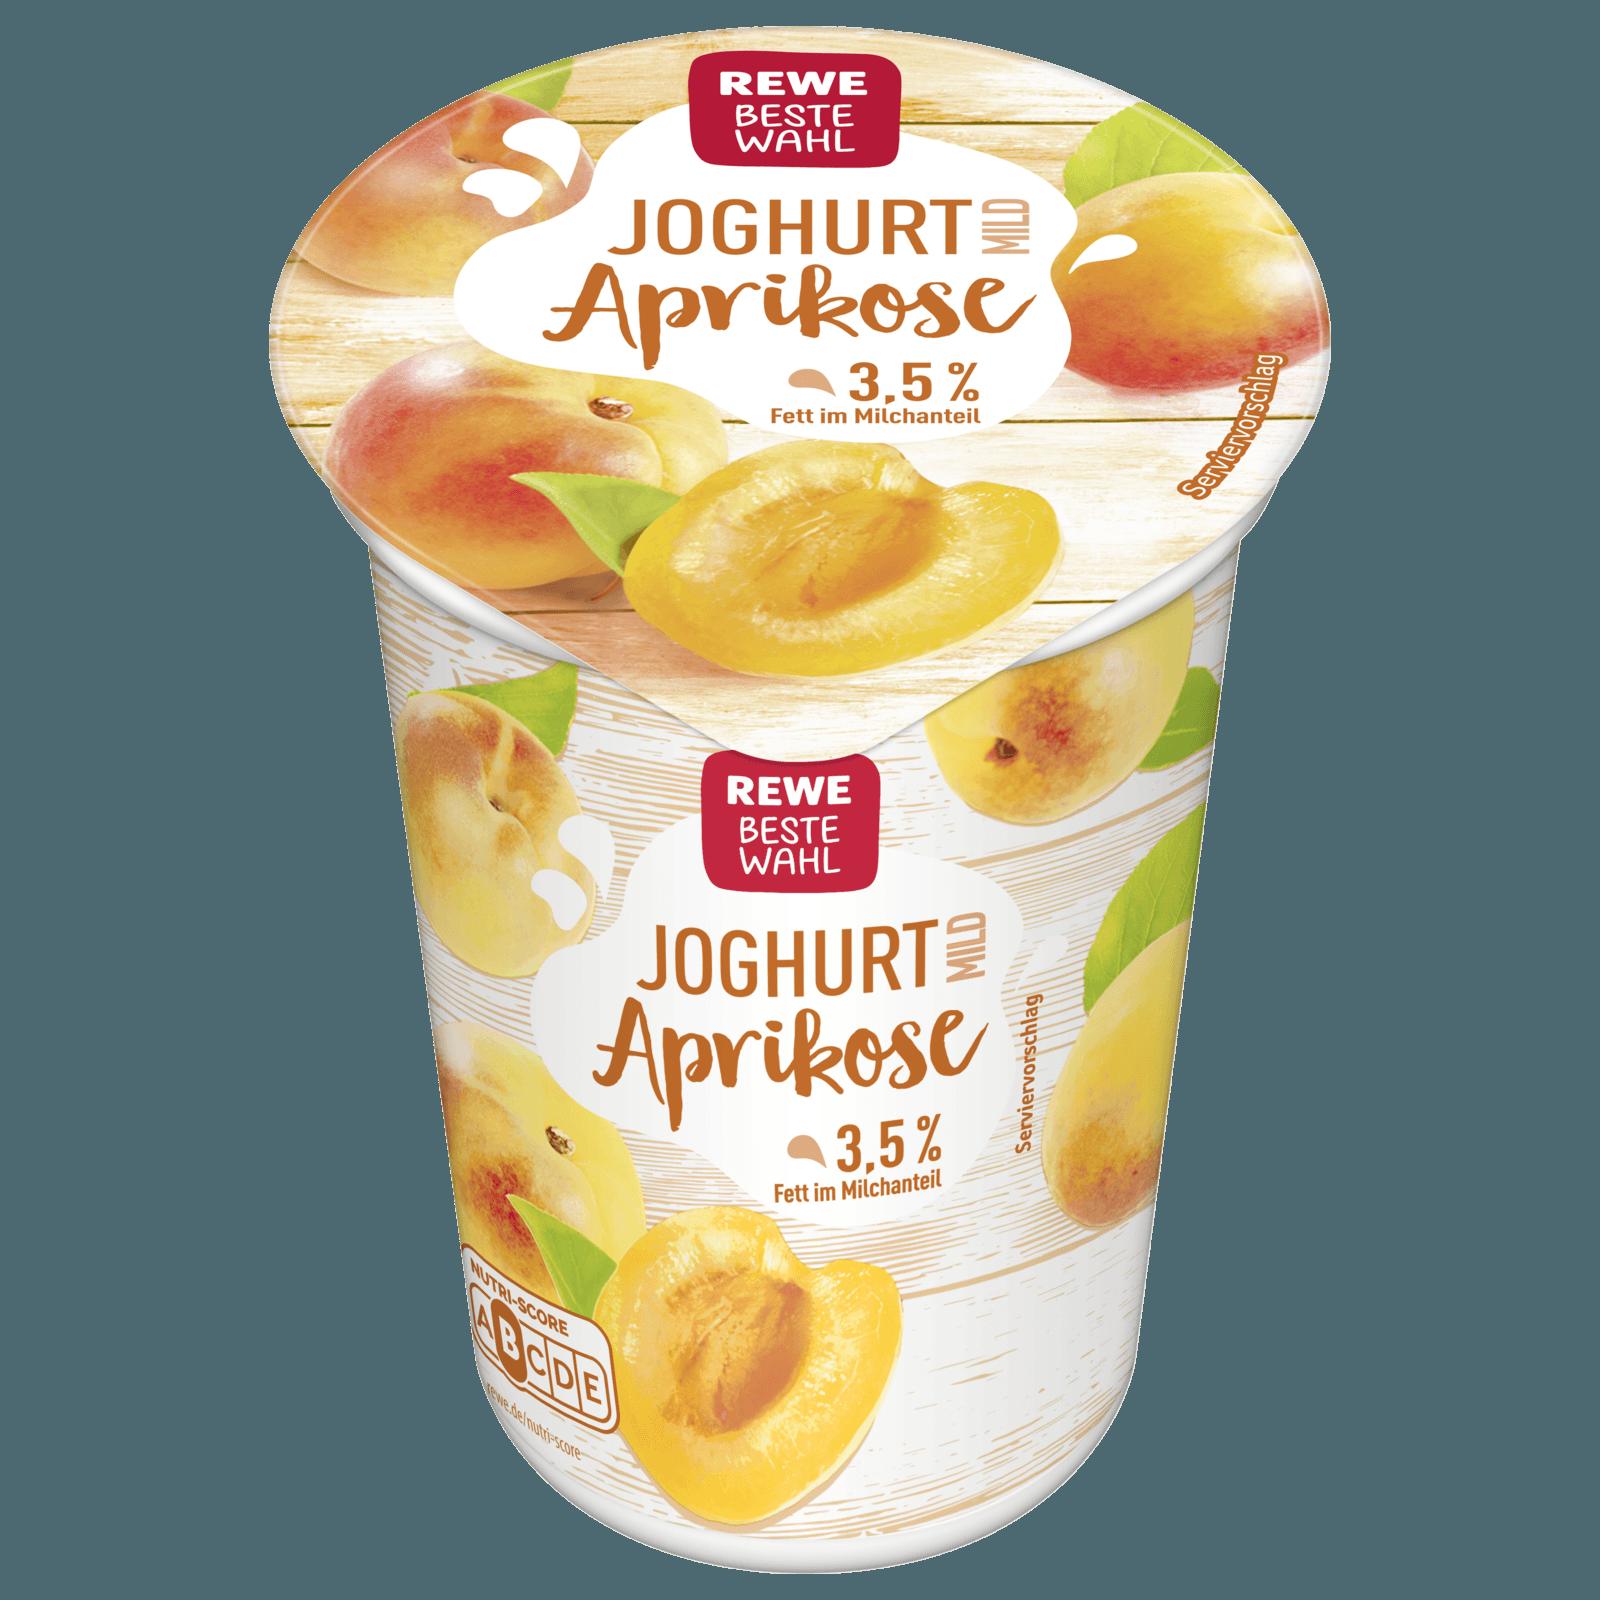 REWE Beste Wahl Joghurt mild Aprikose 250g